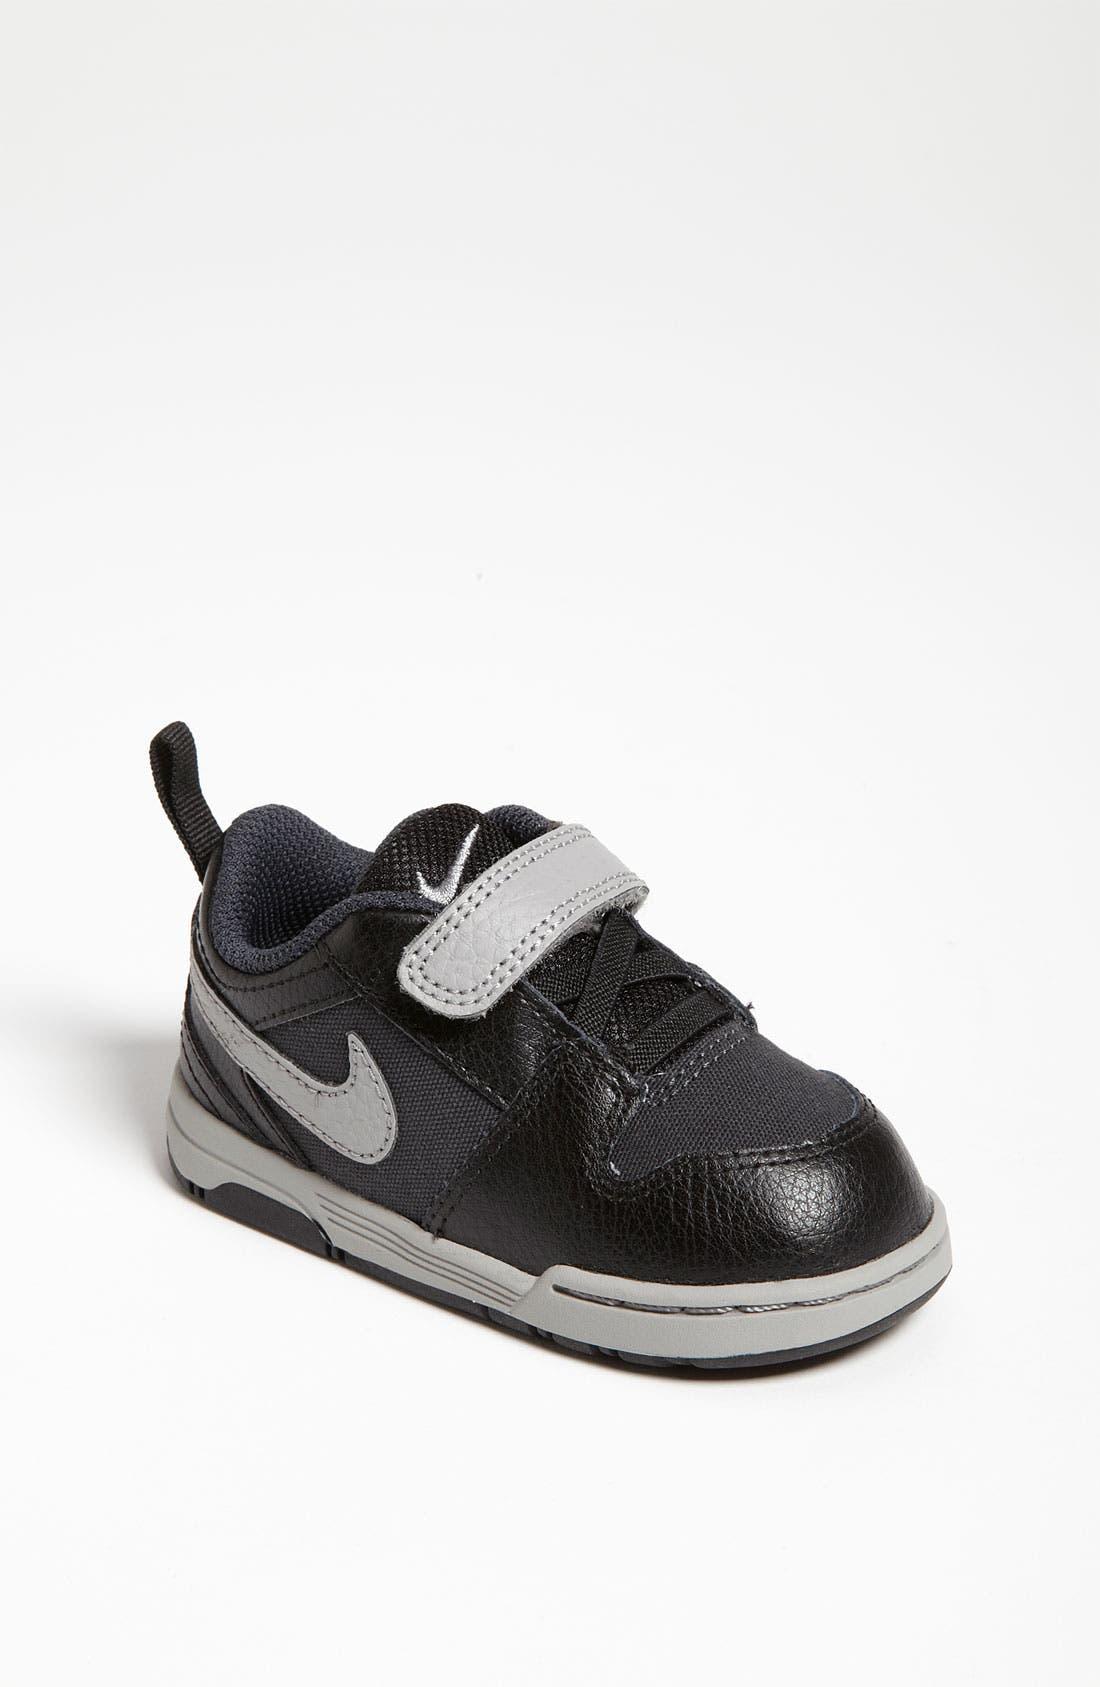 Main Image - Nike 'Mogan 3' Sneaker (Baby, Walker & Toddler)